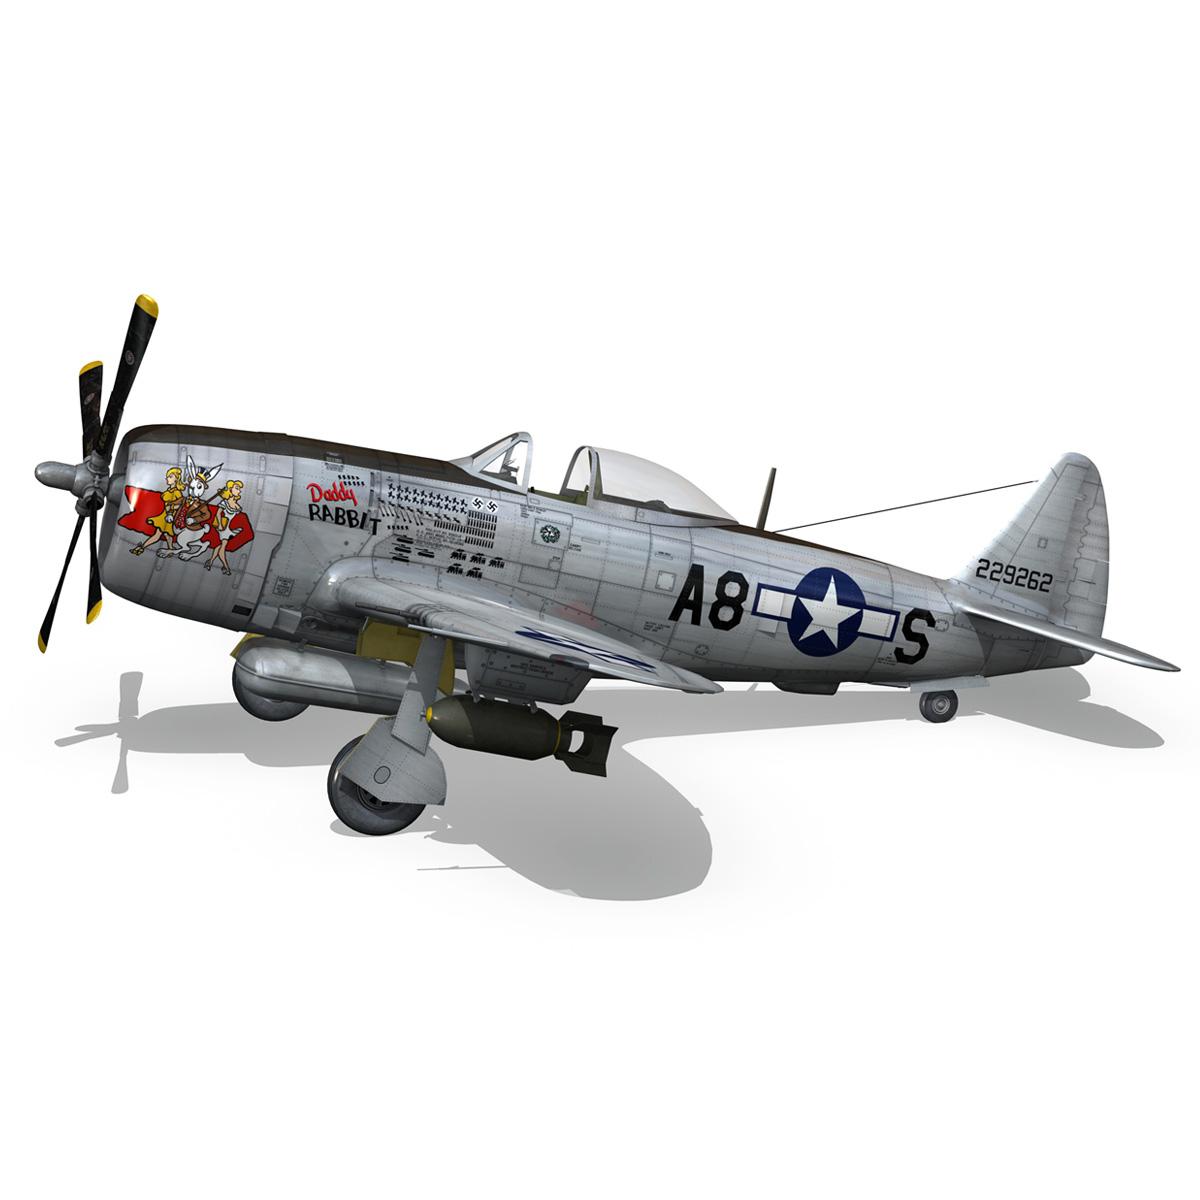 republic p-47 thunderbolt – daddy rabbit 3d model fbx c4d lwo obj 272697